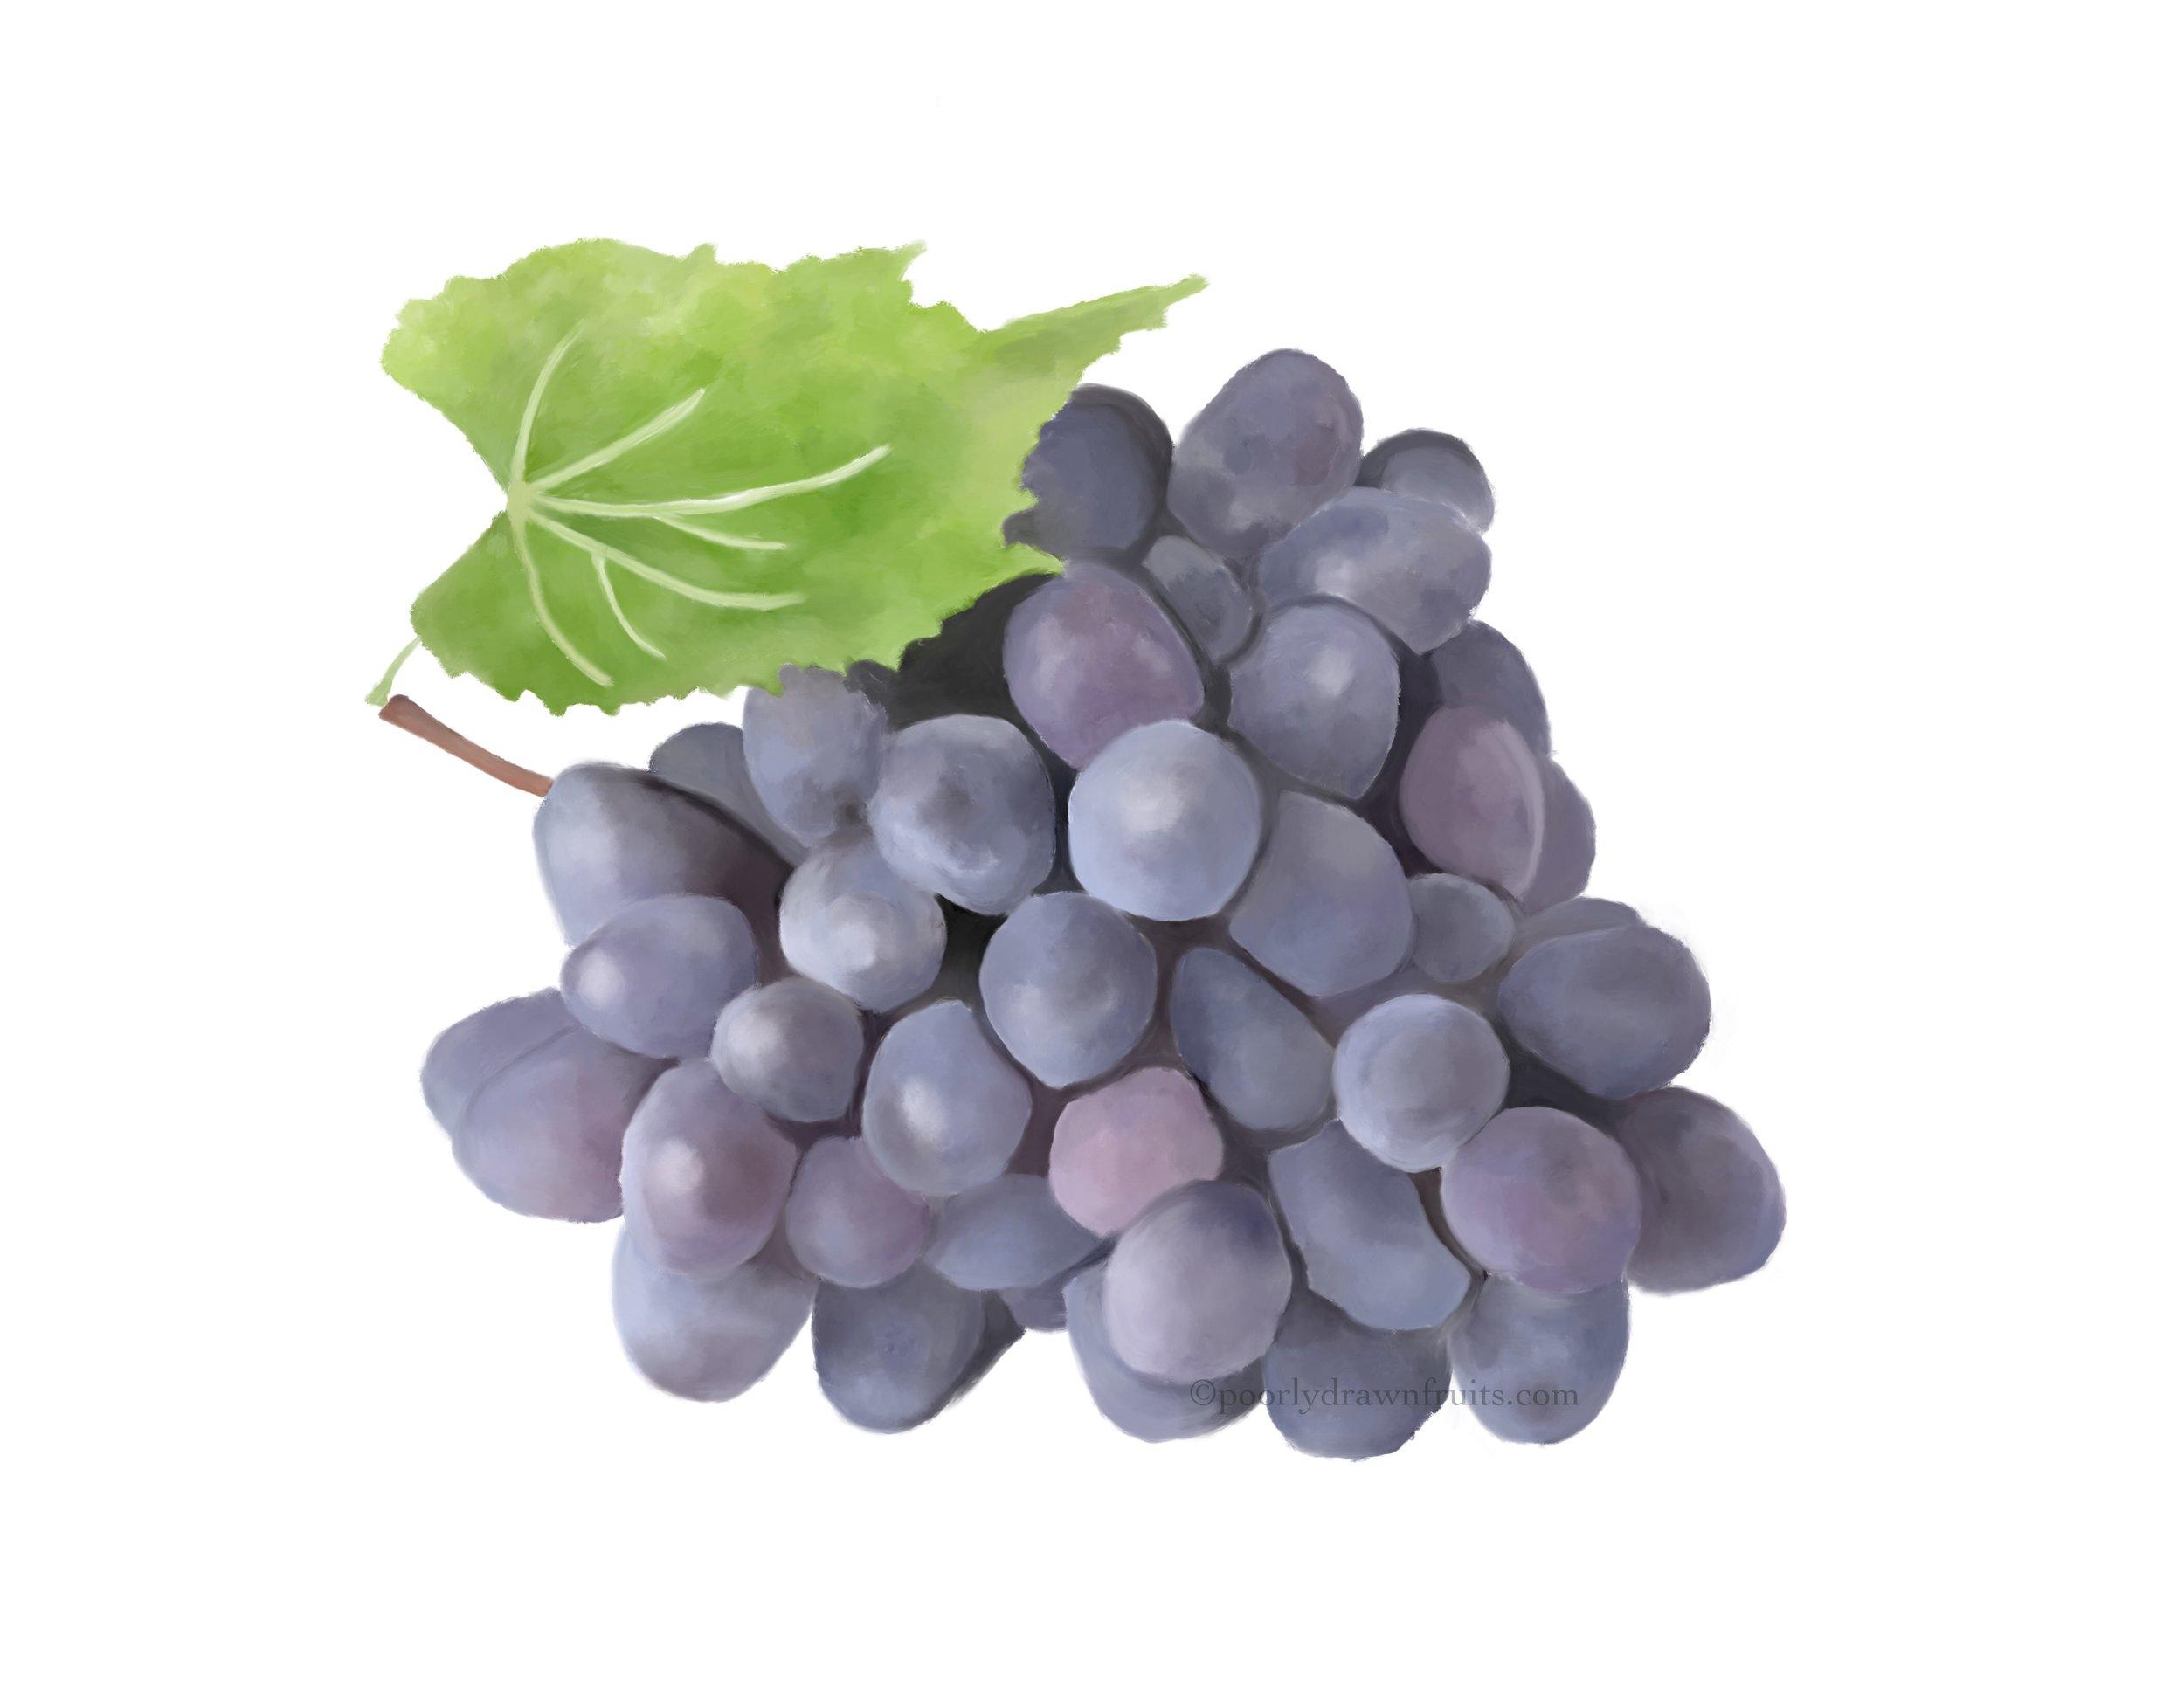 grapes, grape drawing, grape painting, digital grapes, digital painting